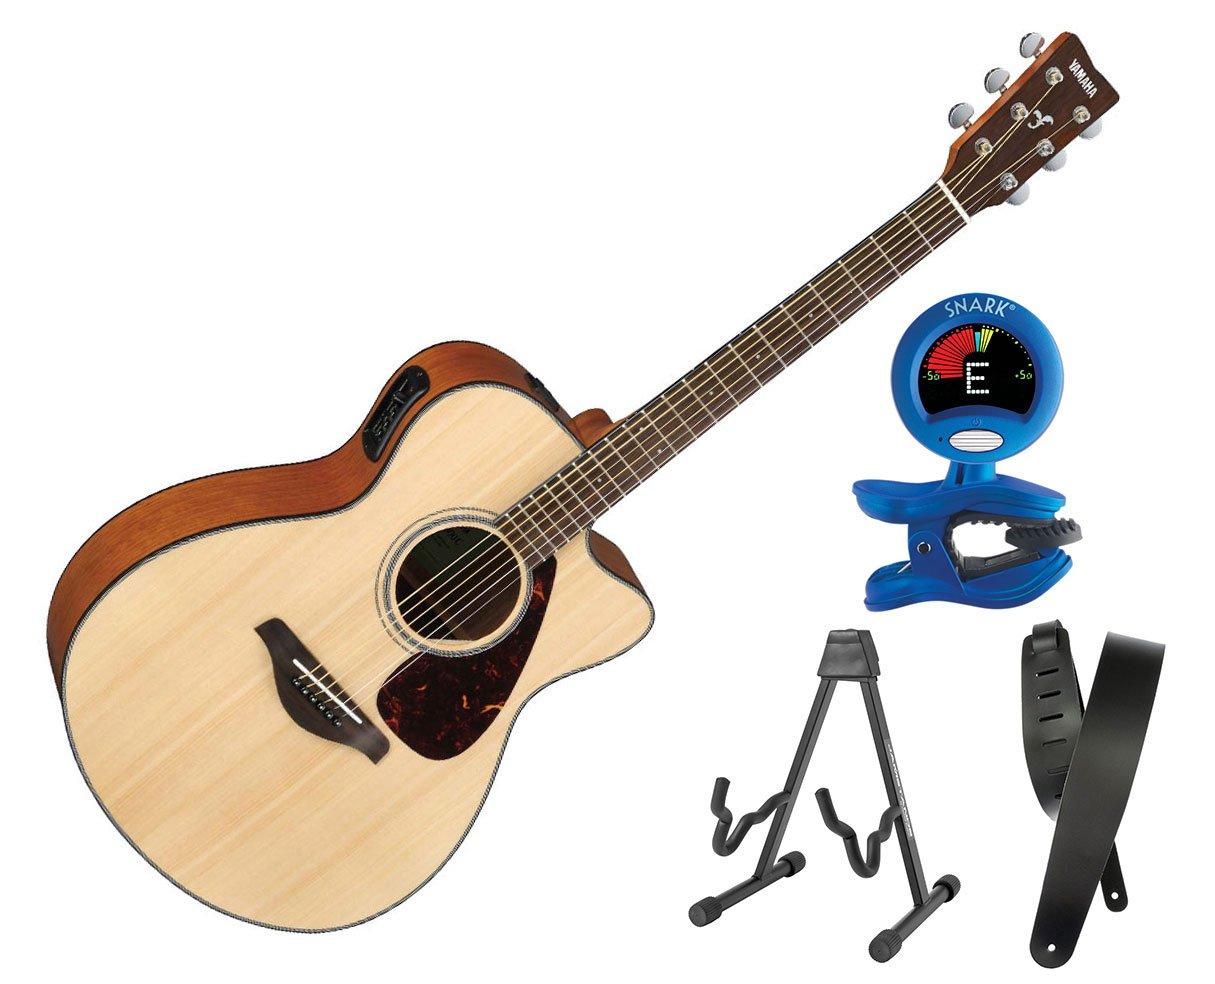 Yamaha fsx800 C acústica guitarra eléctrica pequeño cuerpo sólido superior - Natural Bonus Kit: Amazon.es: Instrumentos musicales